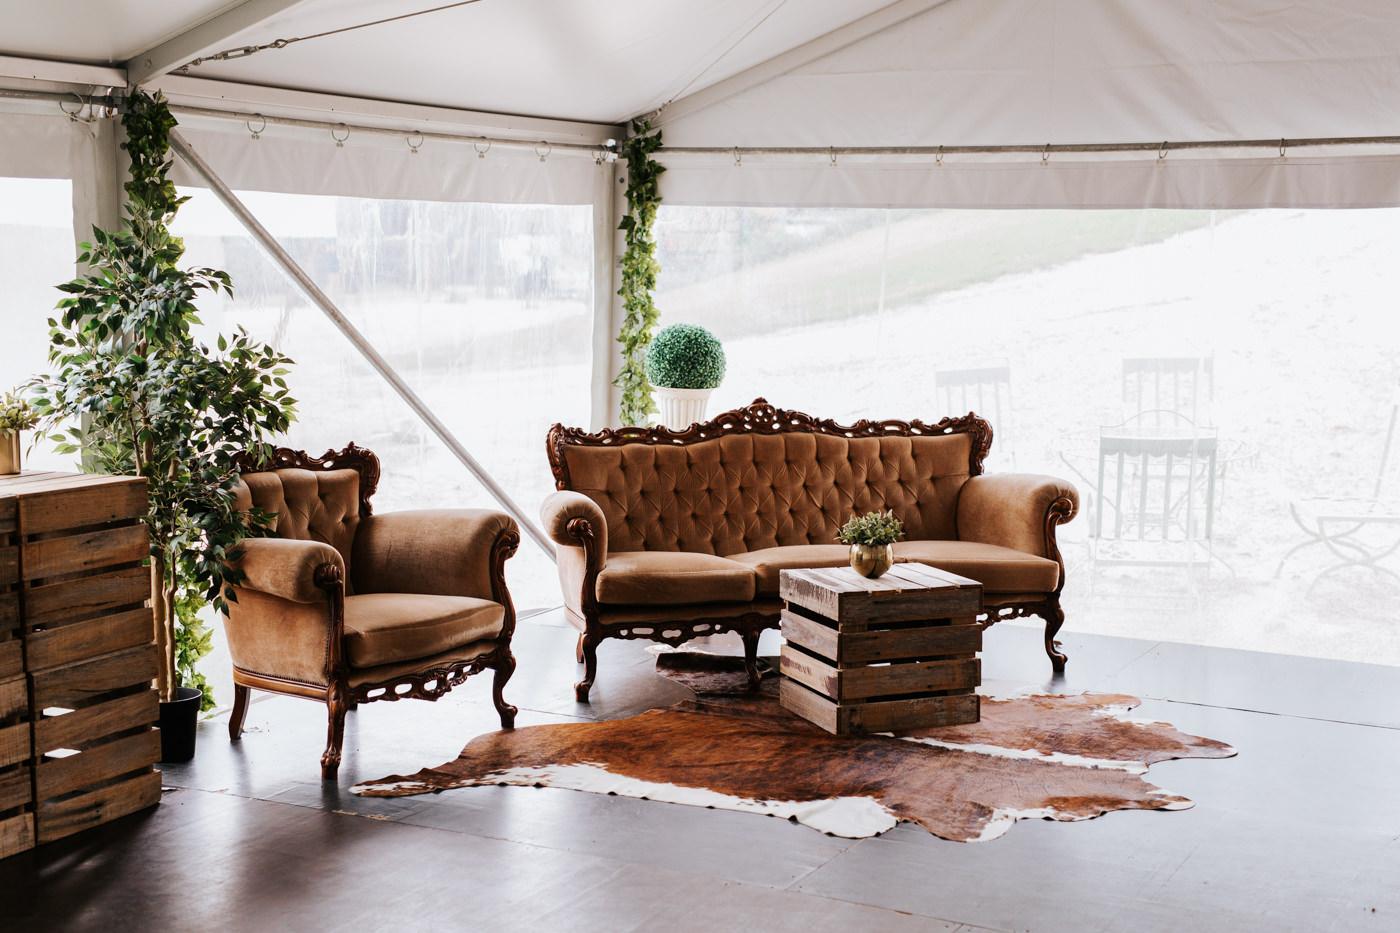 Nick & Vanezza - Fernbank Farm Wedding - Samantha Heather Photography-42.jpg